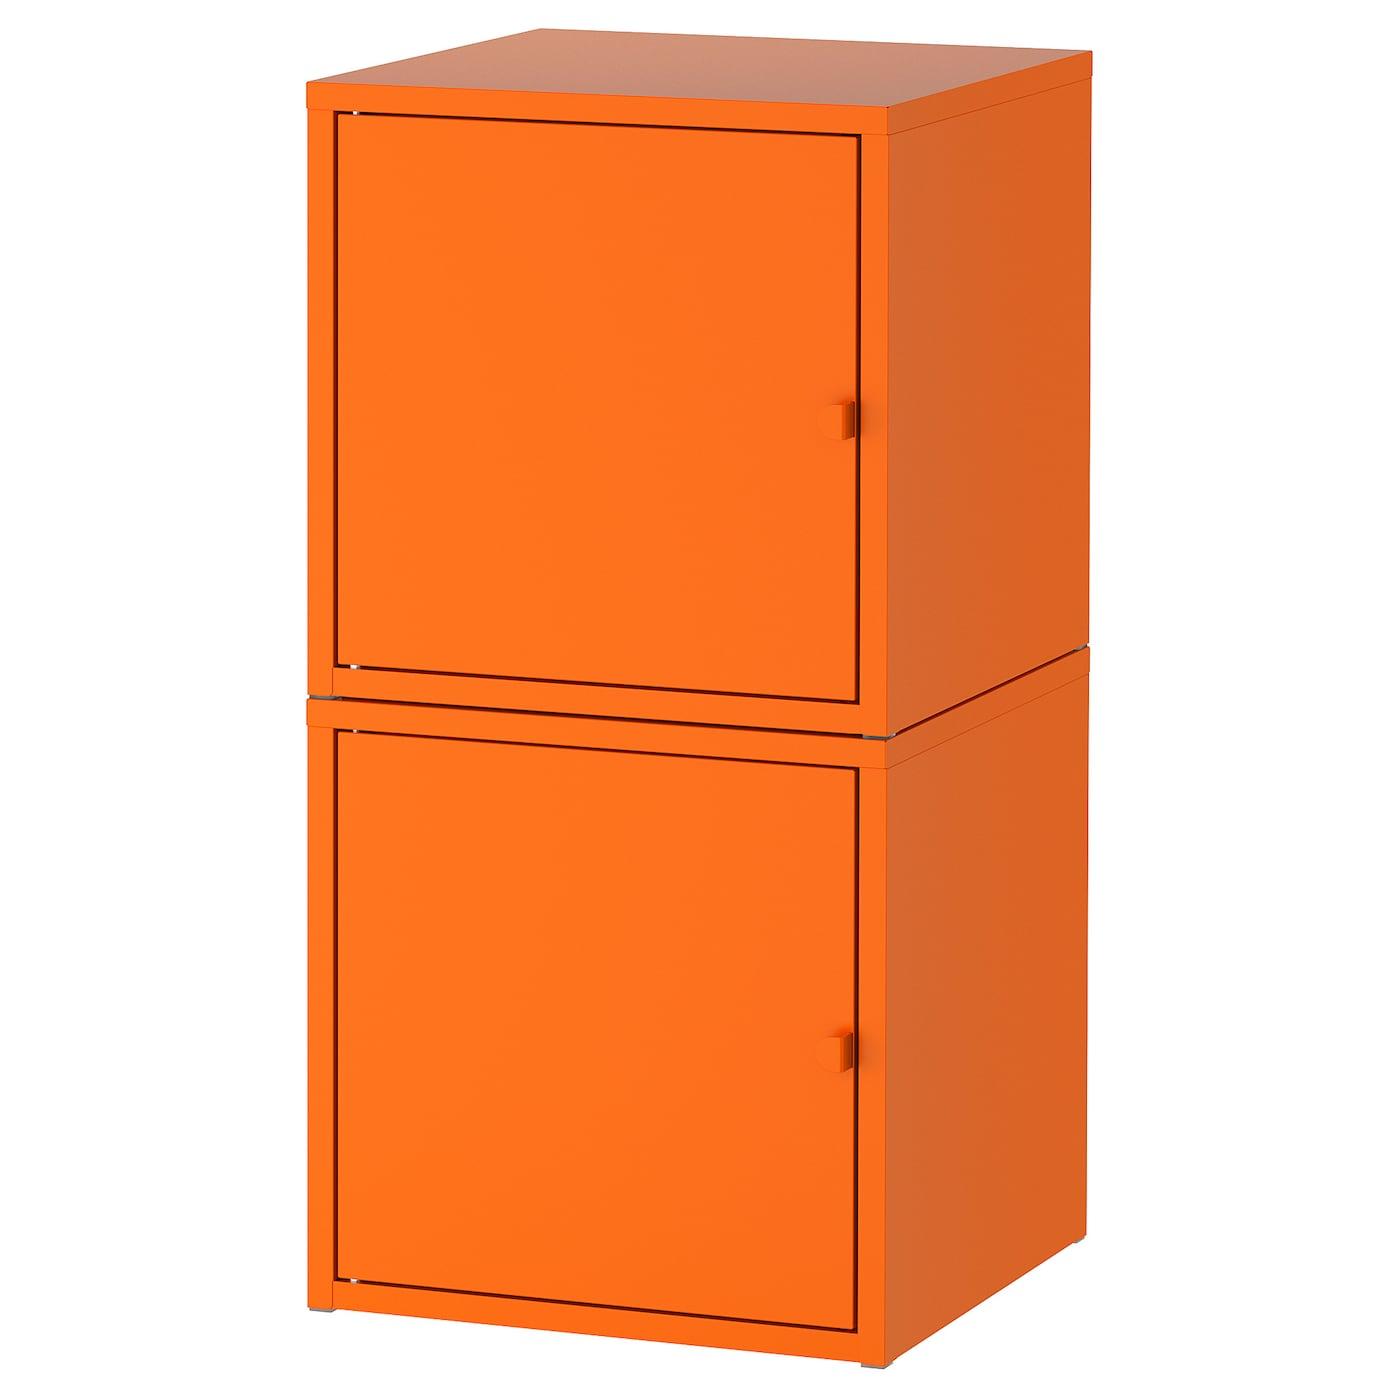 Beau IKEA LIXHULT Storage Combination